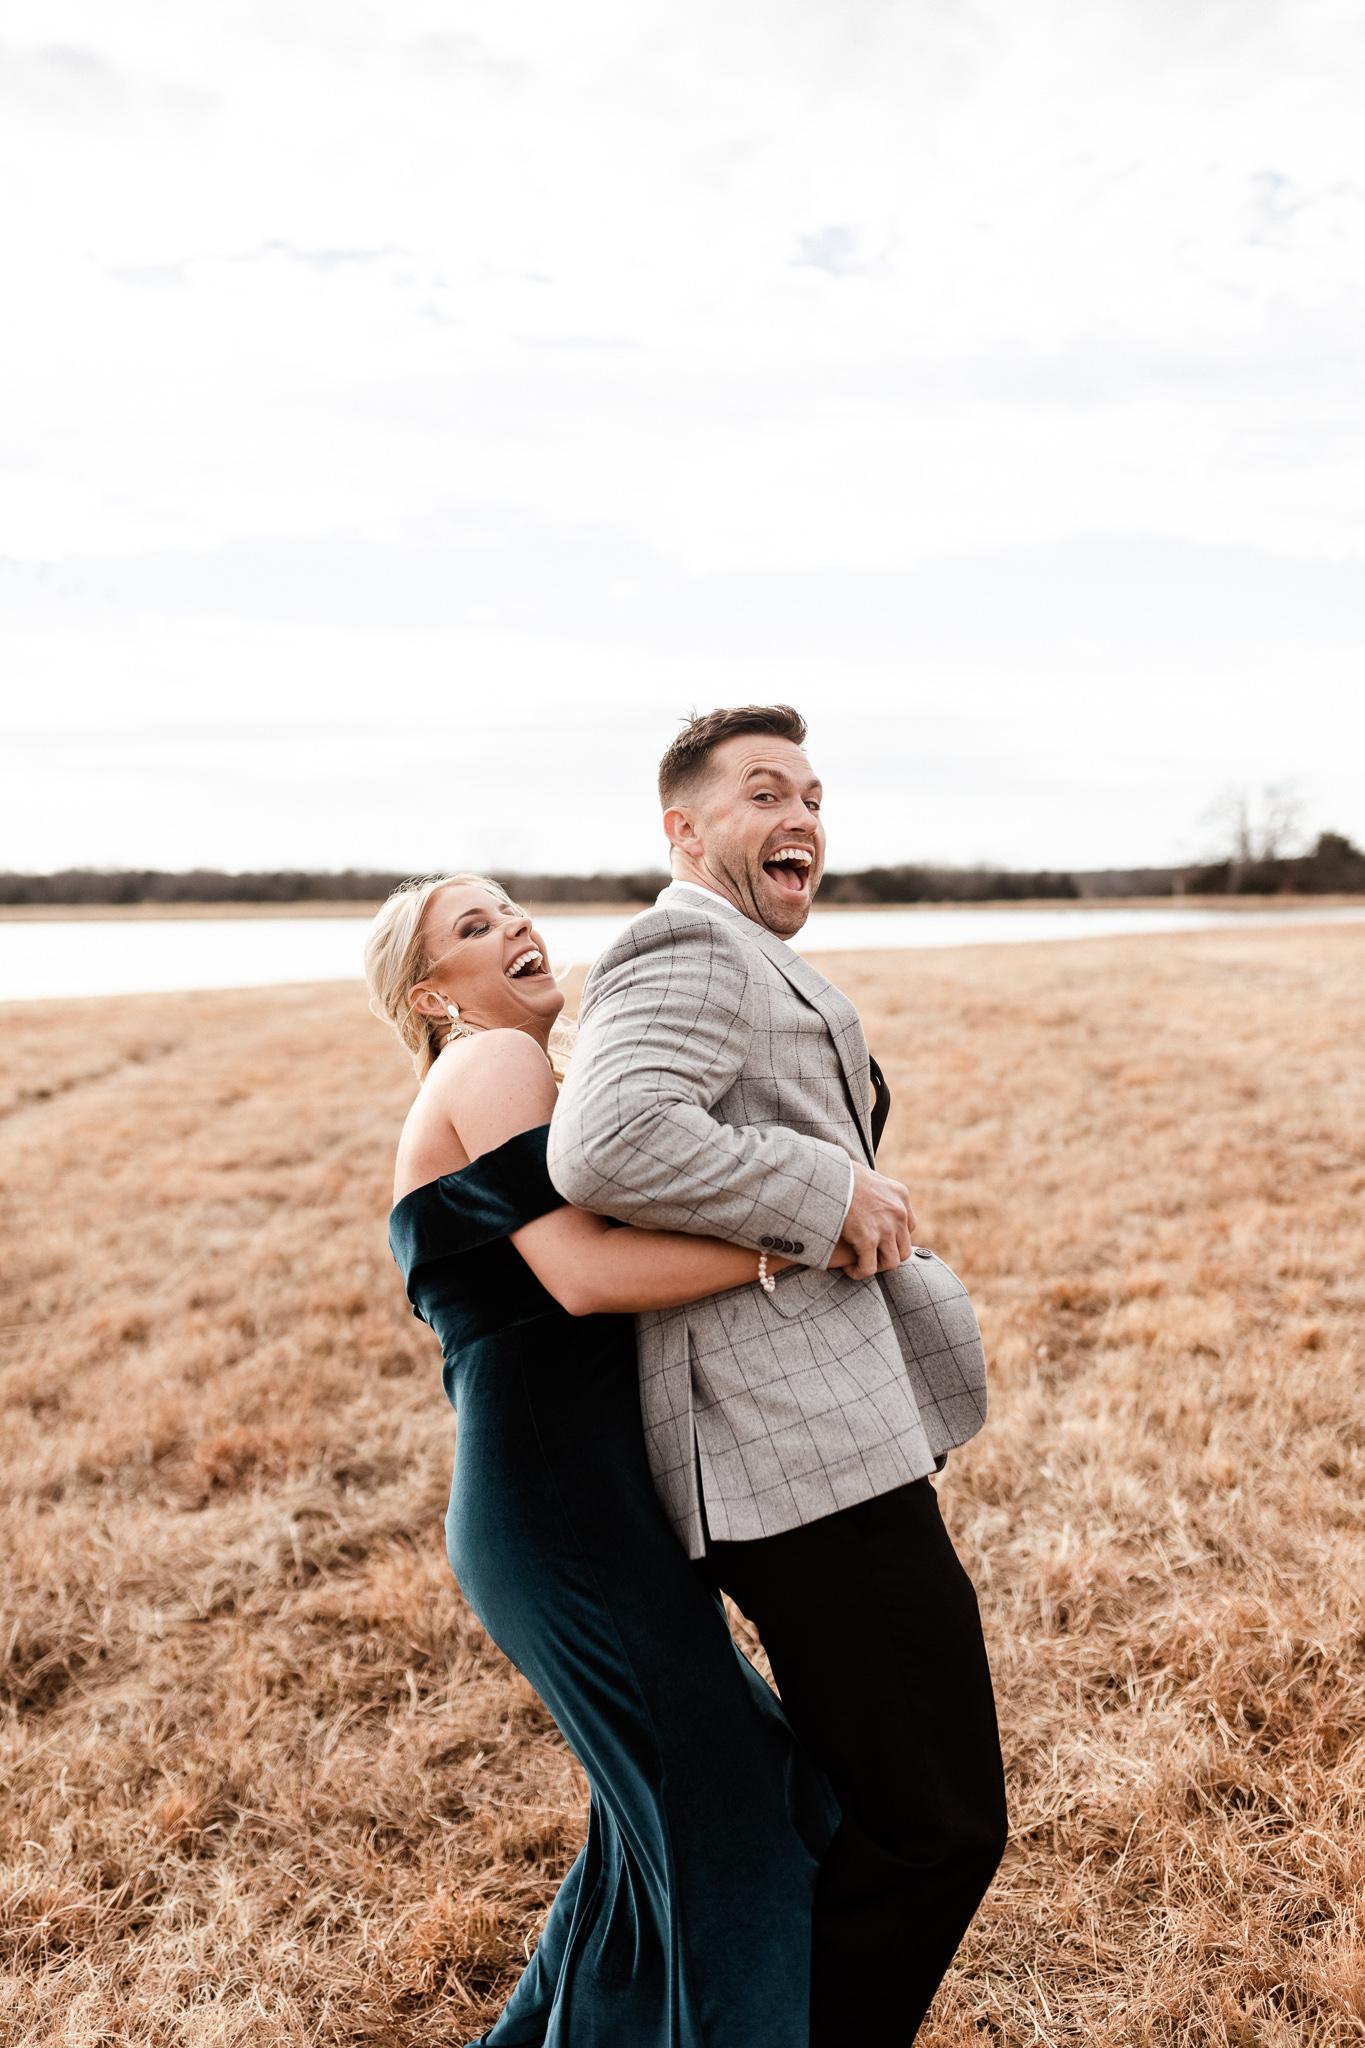 Wade + Stephanie | Warm Open Field Engagements | Oklahoma Wedding Photographer-25.jpg